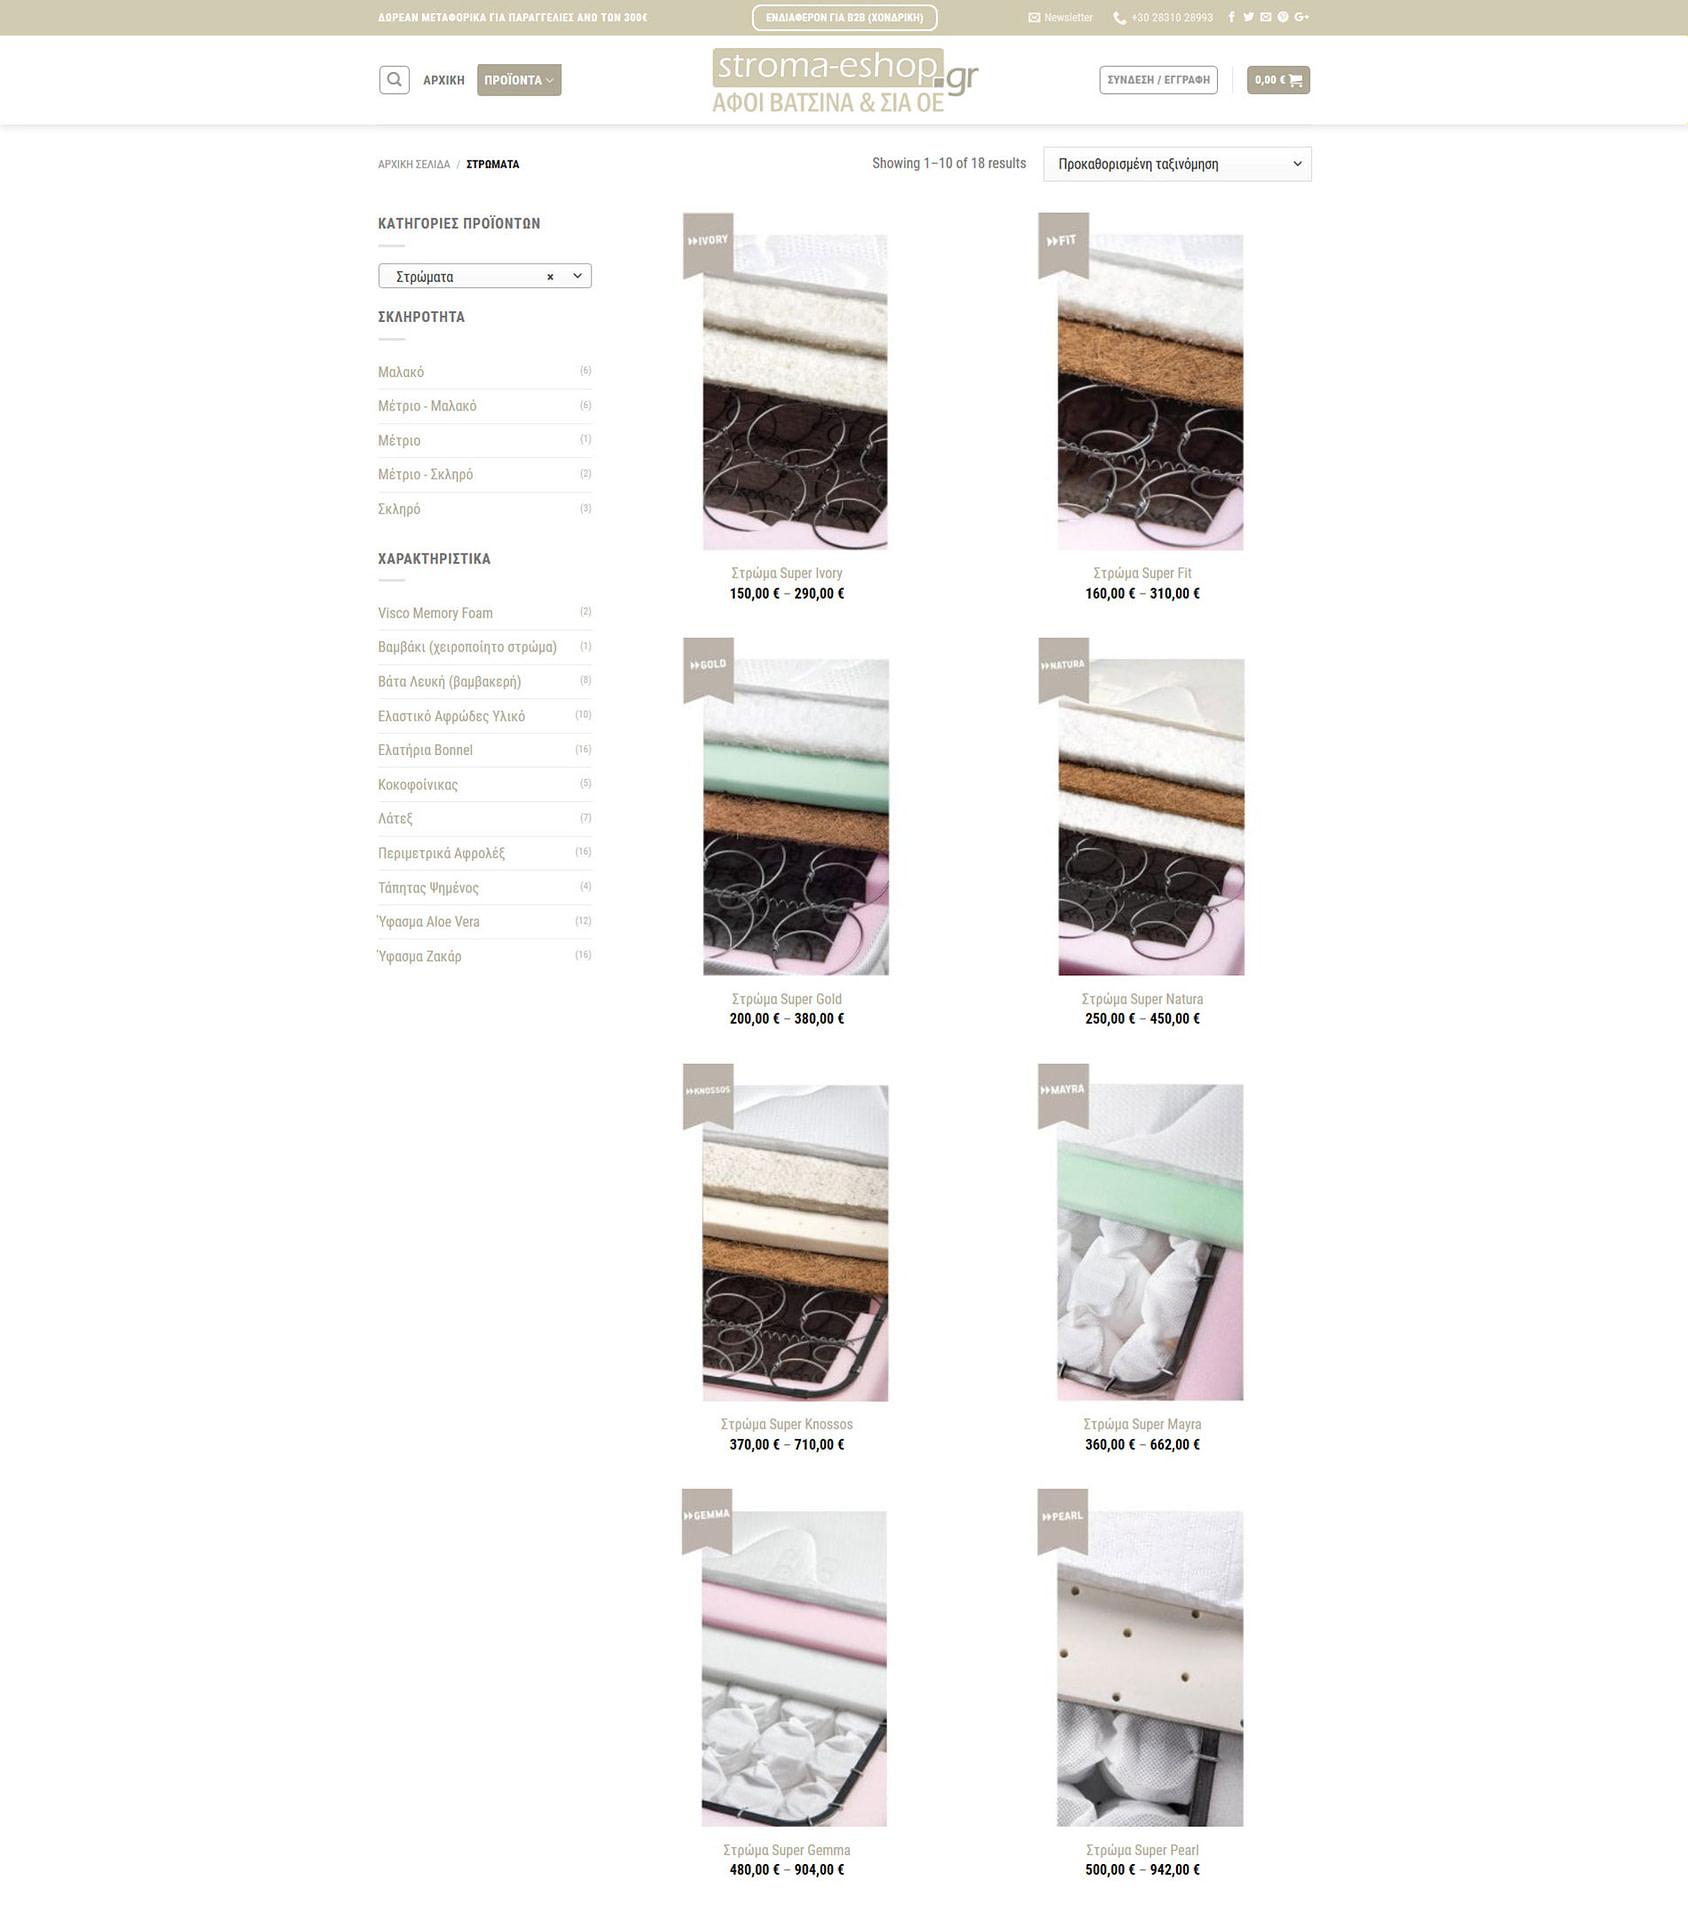 Stroma-eshop.gr - TMY Web Develpment